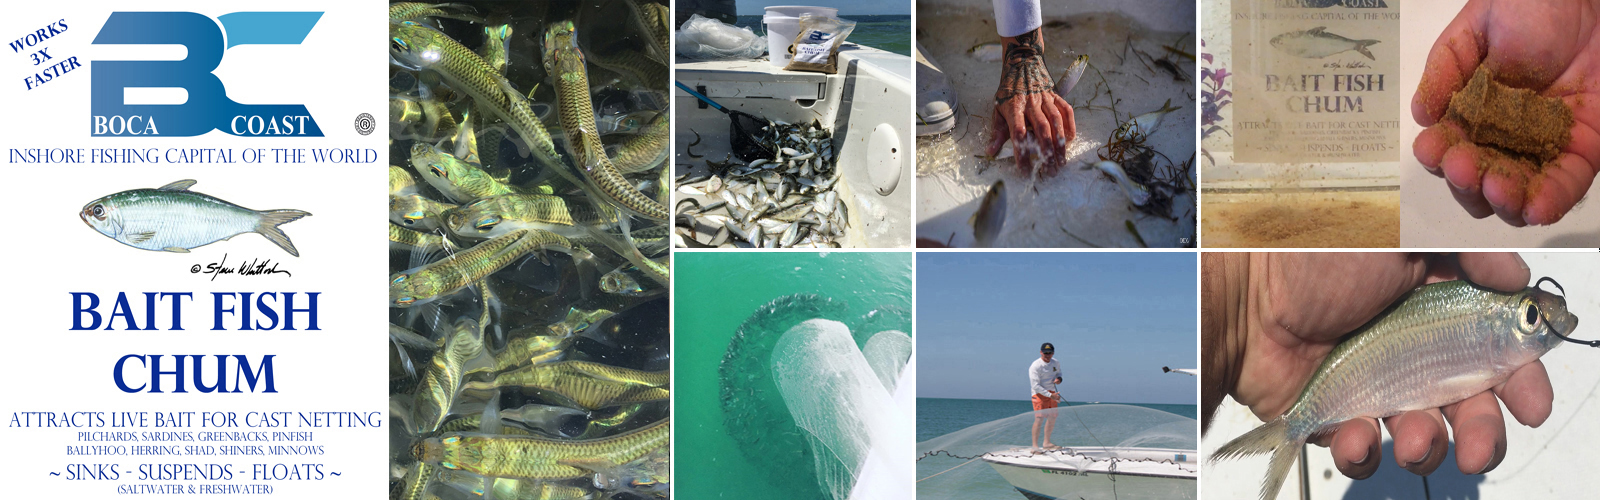 Bait fish chum for cast netting